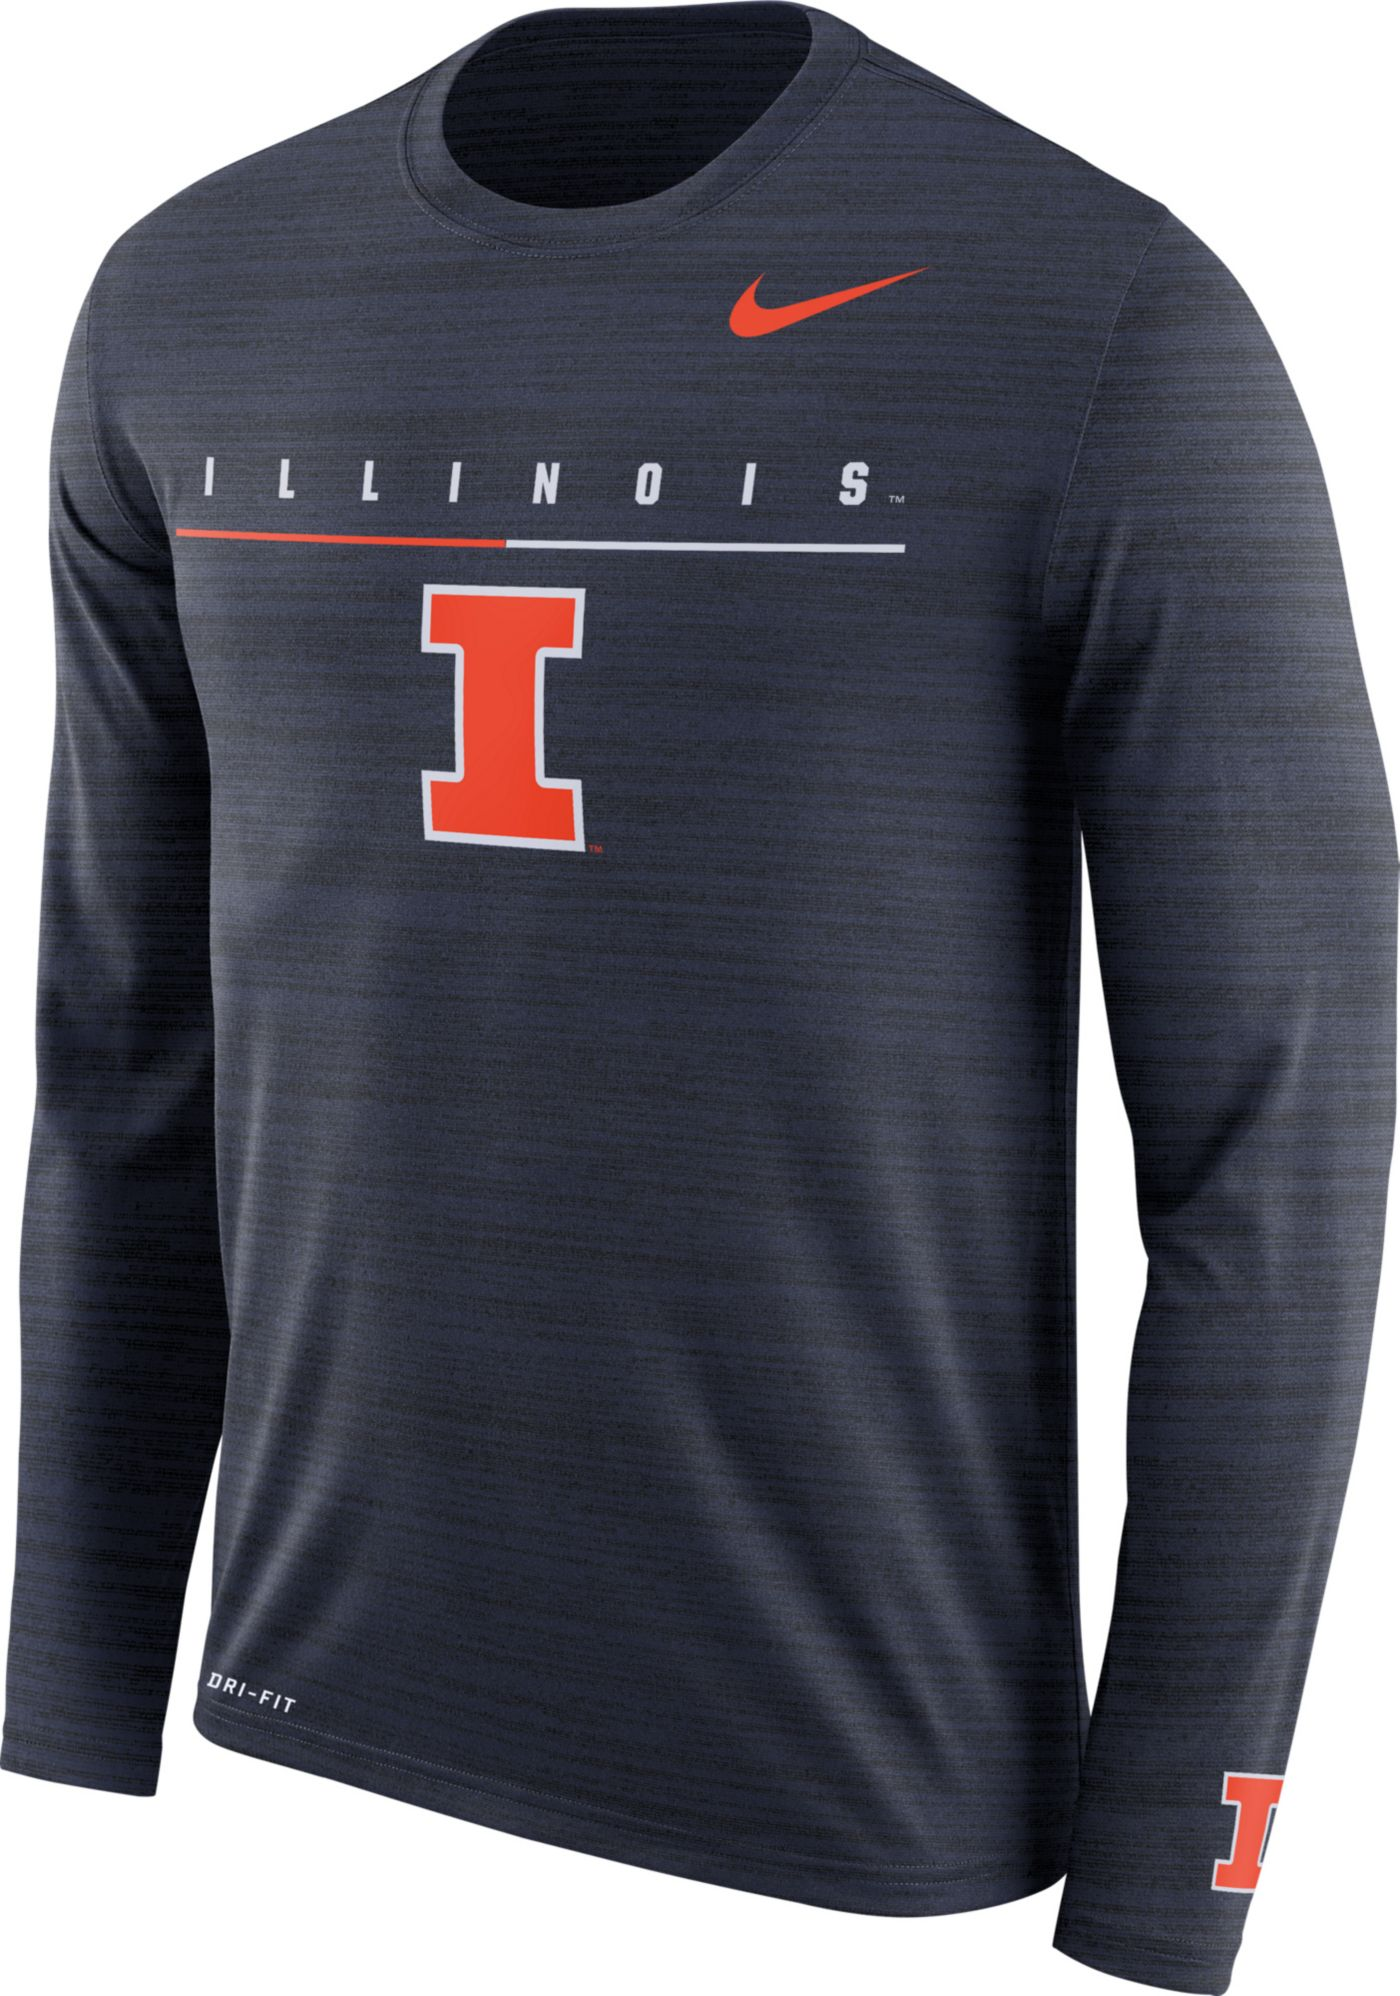 Nike Men's Illinois Fighting Illini Blue Velocity Legend Graphic Long Sleeve T-Shirt